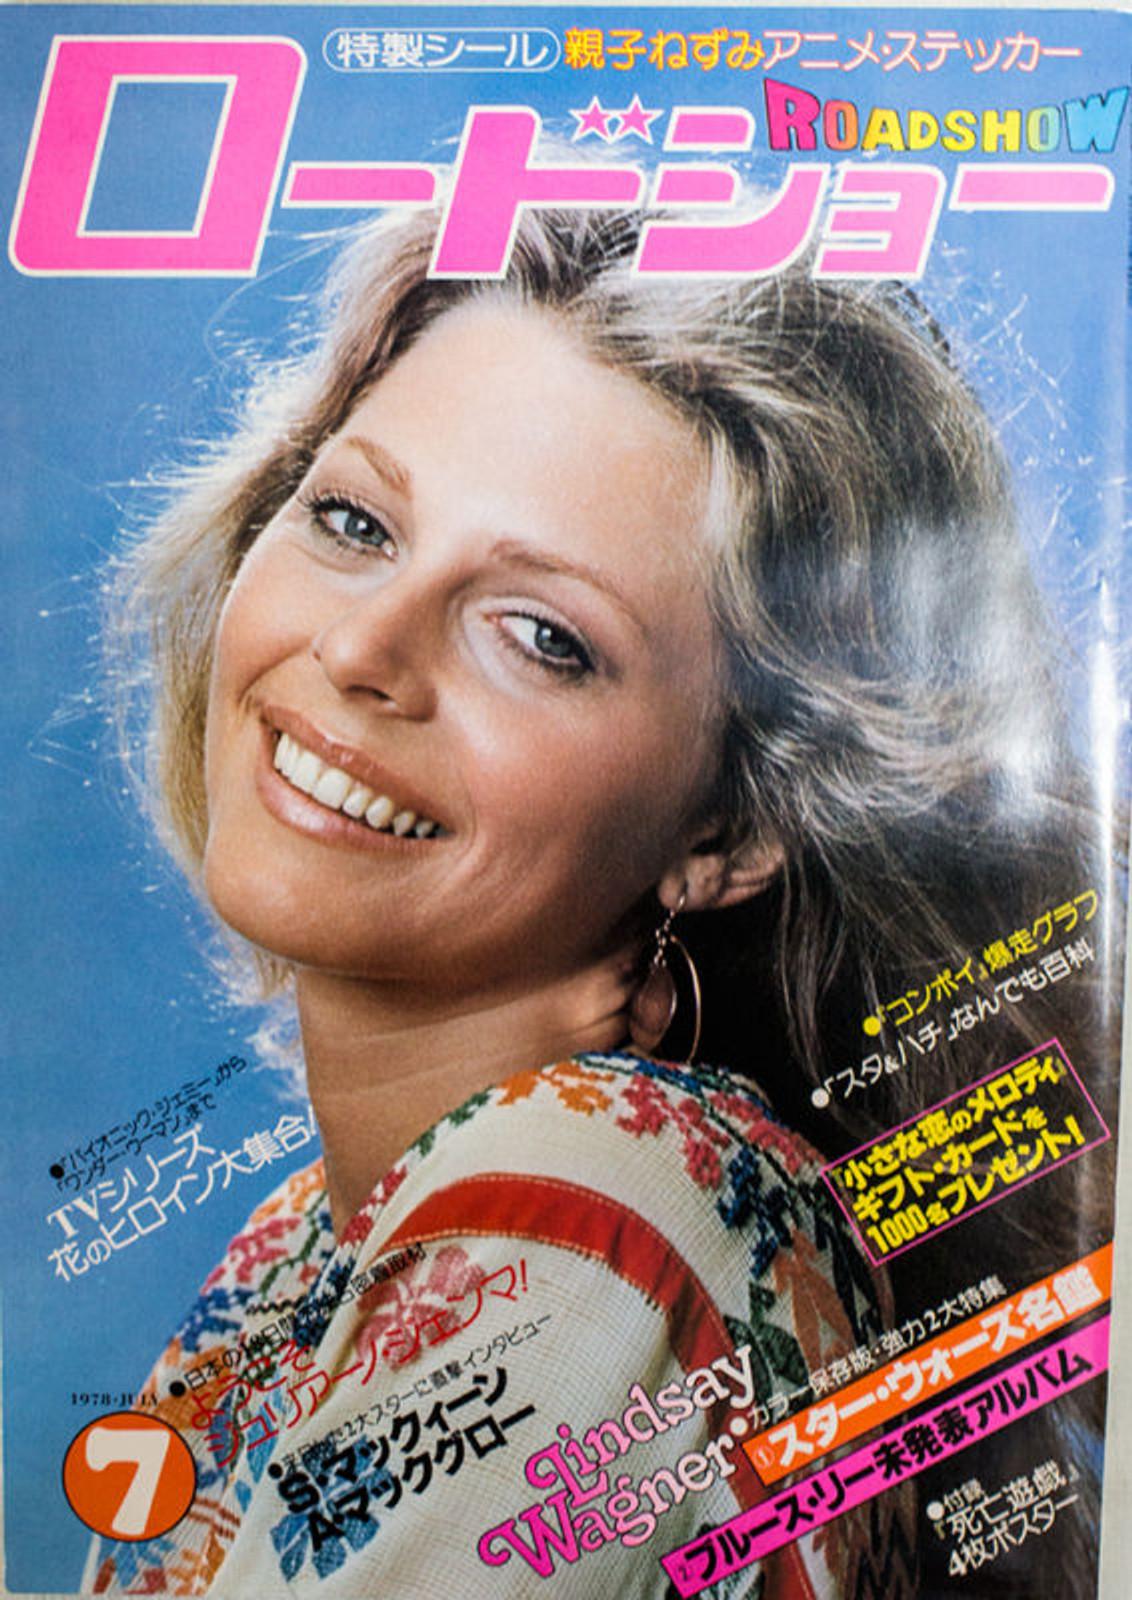 ROADSHOW 07/1978 Japan Movie Magazine LINDSAY WAGNER/BLUCE LEE/GIULIANO GEMMA